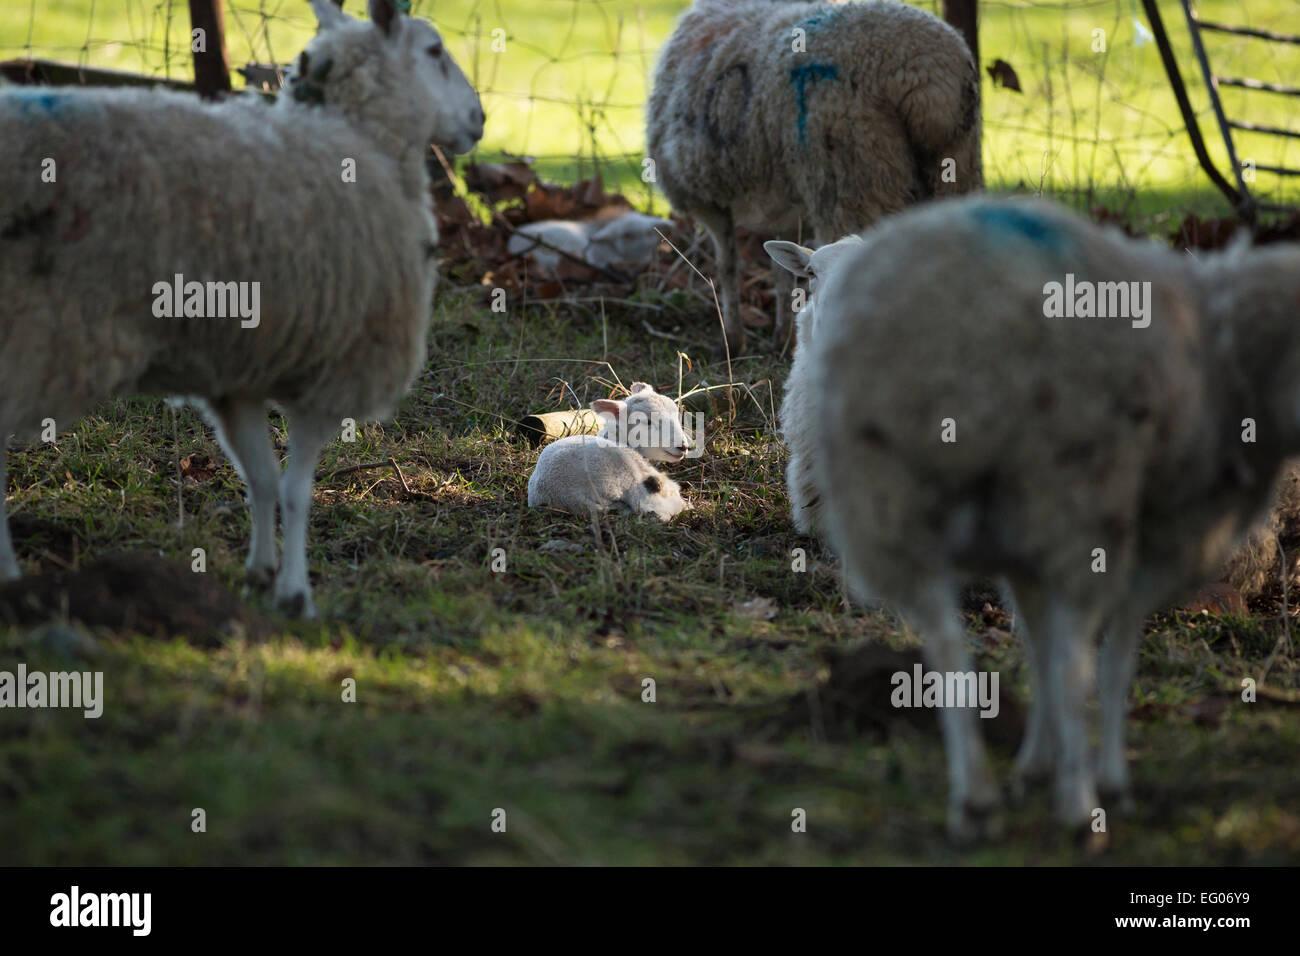 sheep ewe with sunlit lamb in woods - Stock Image